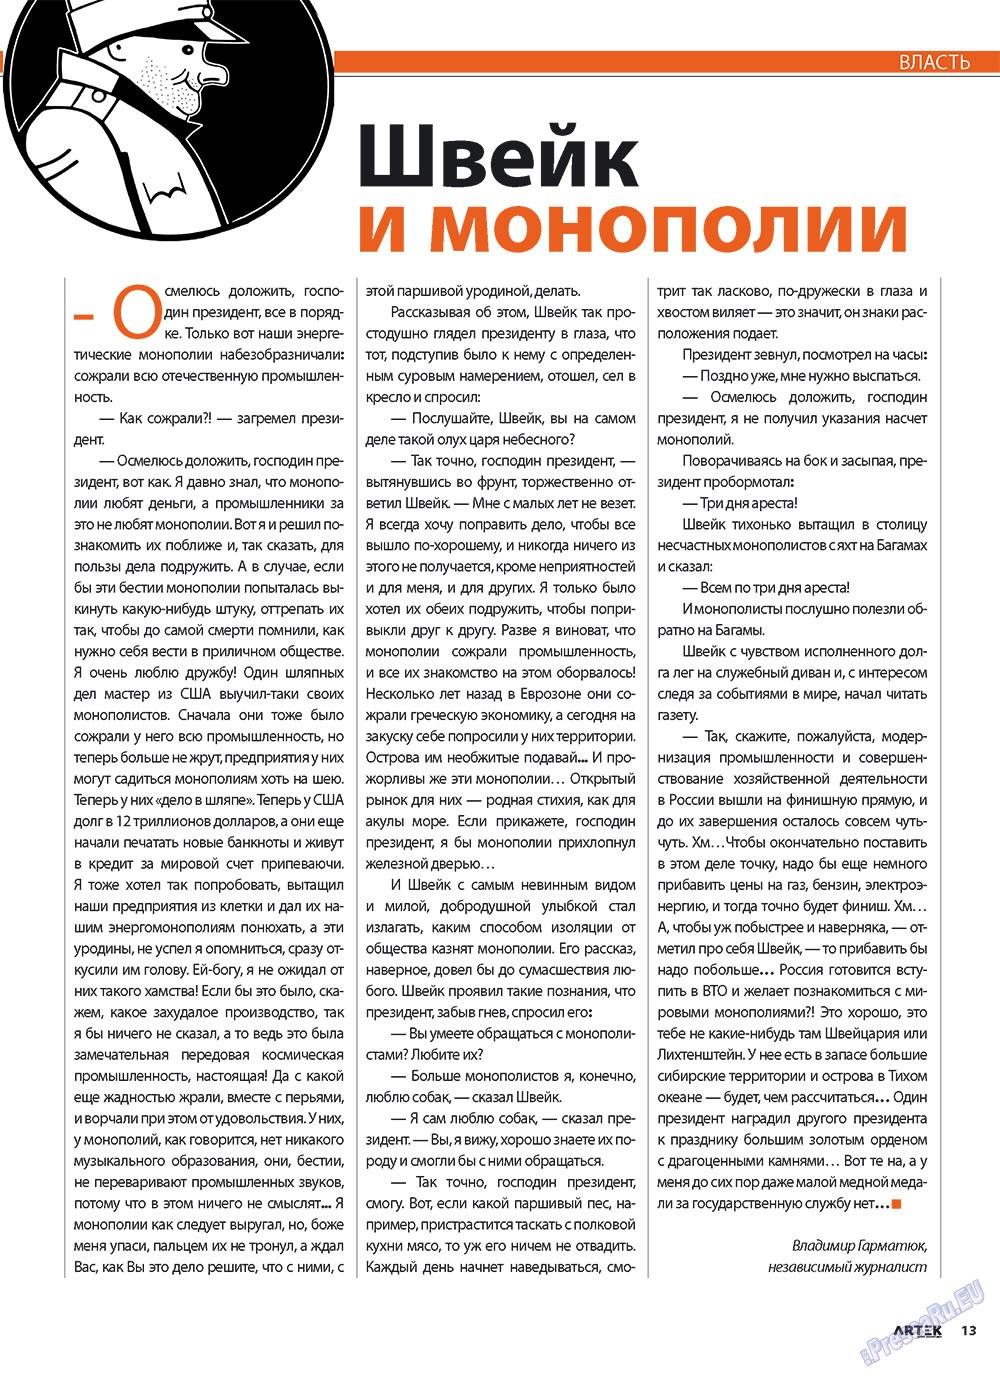 Артек (журнал). 2010 год, номер 3, стр. 15